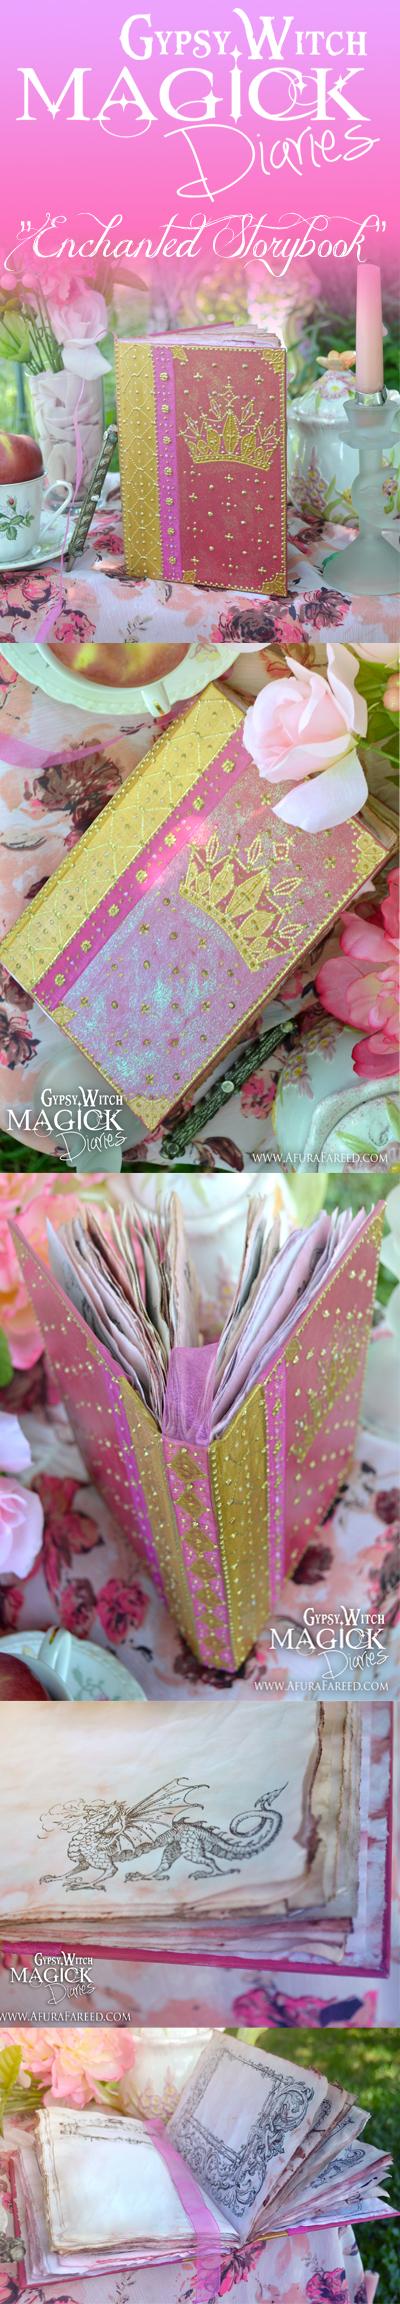 """Enchanted Storybook"" Spiritual journal, a handmade fairytale themed book of shadows: www.AfuraFareed.com"